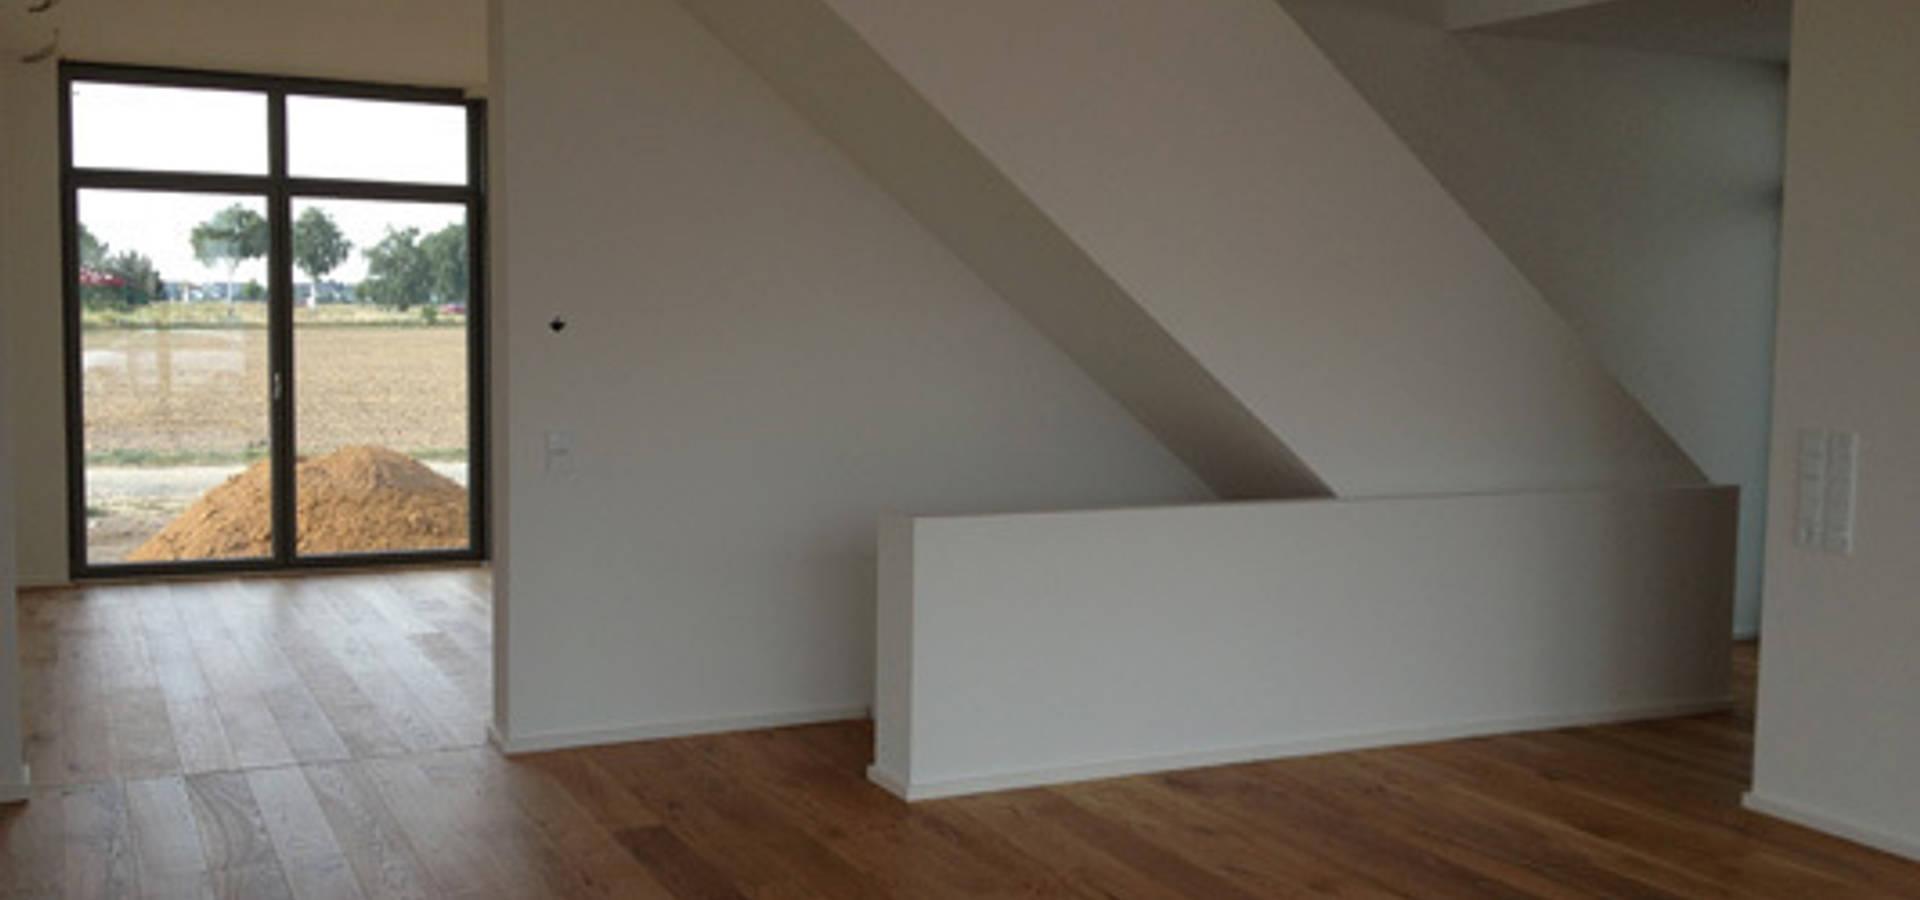 Architekturbüro Schlüter